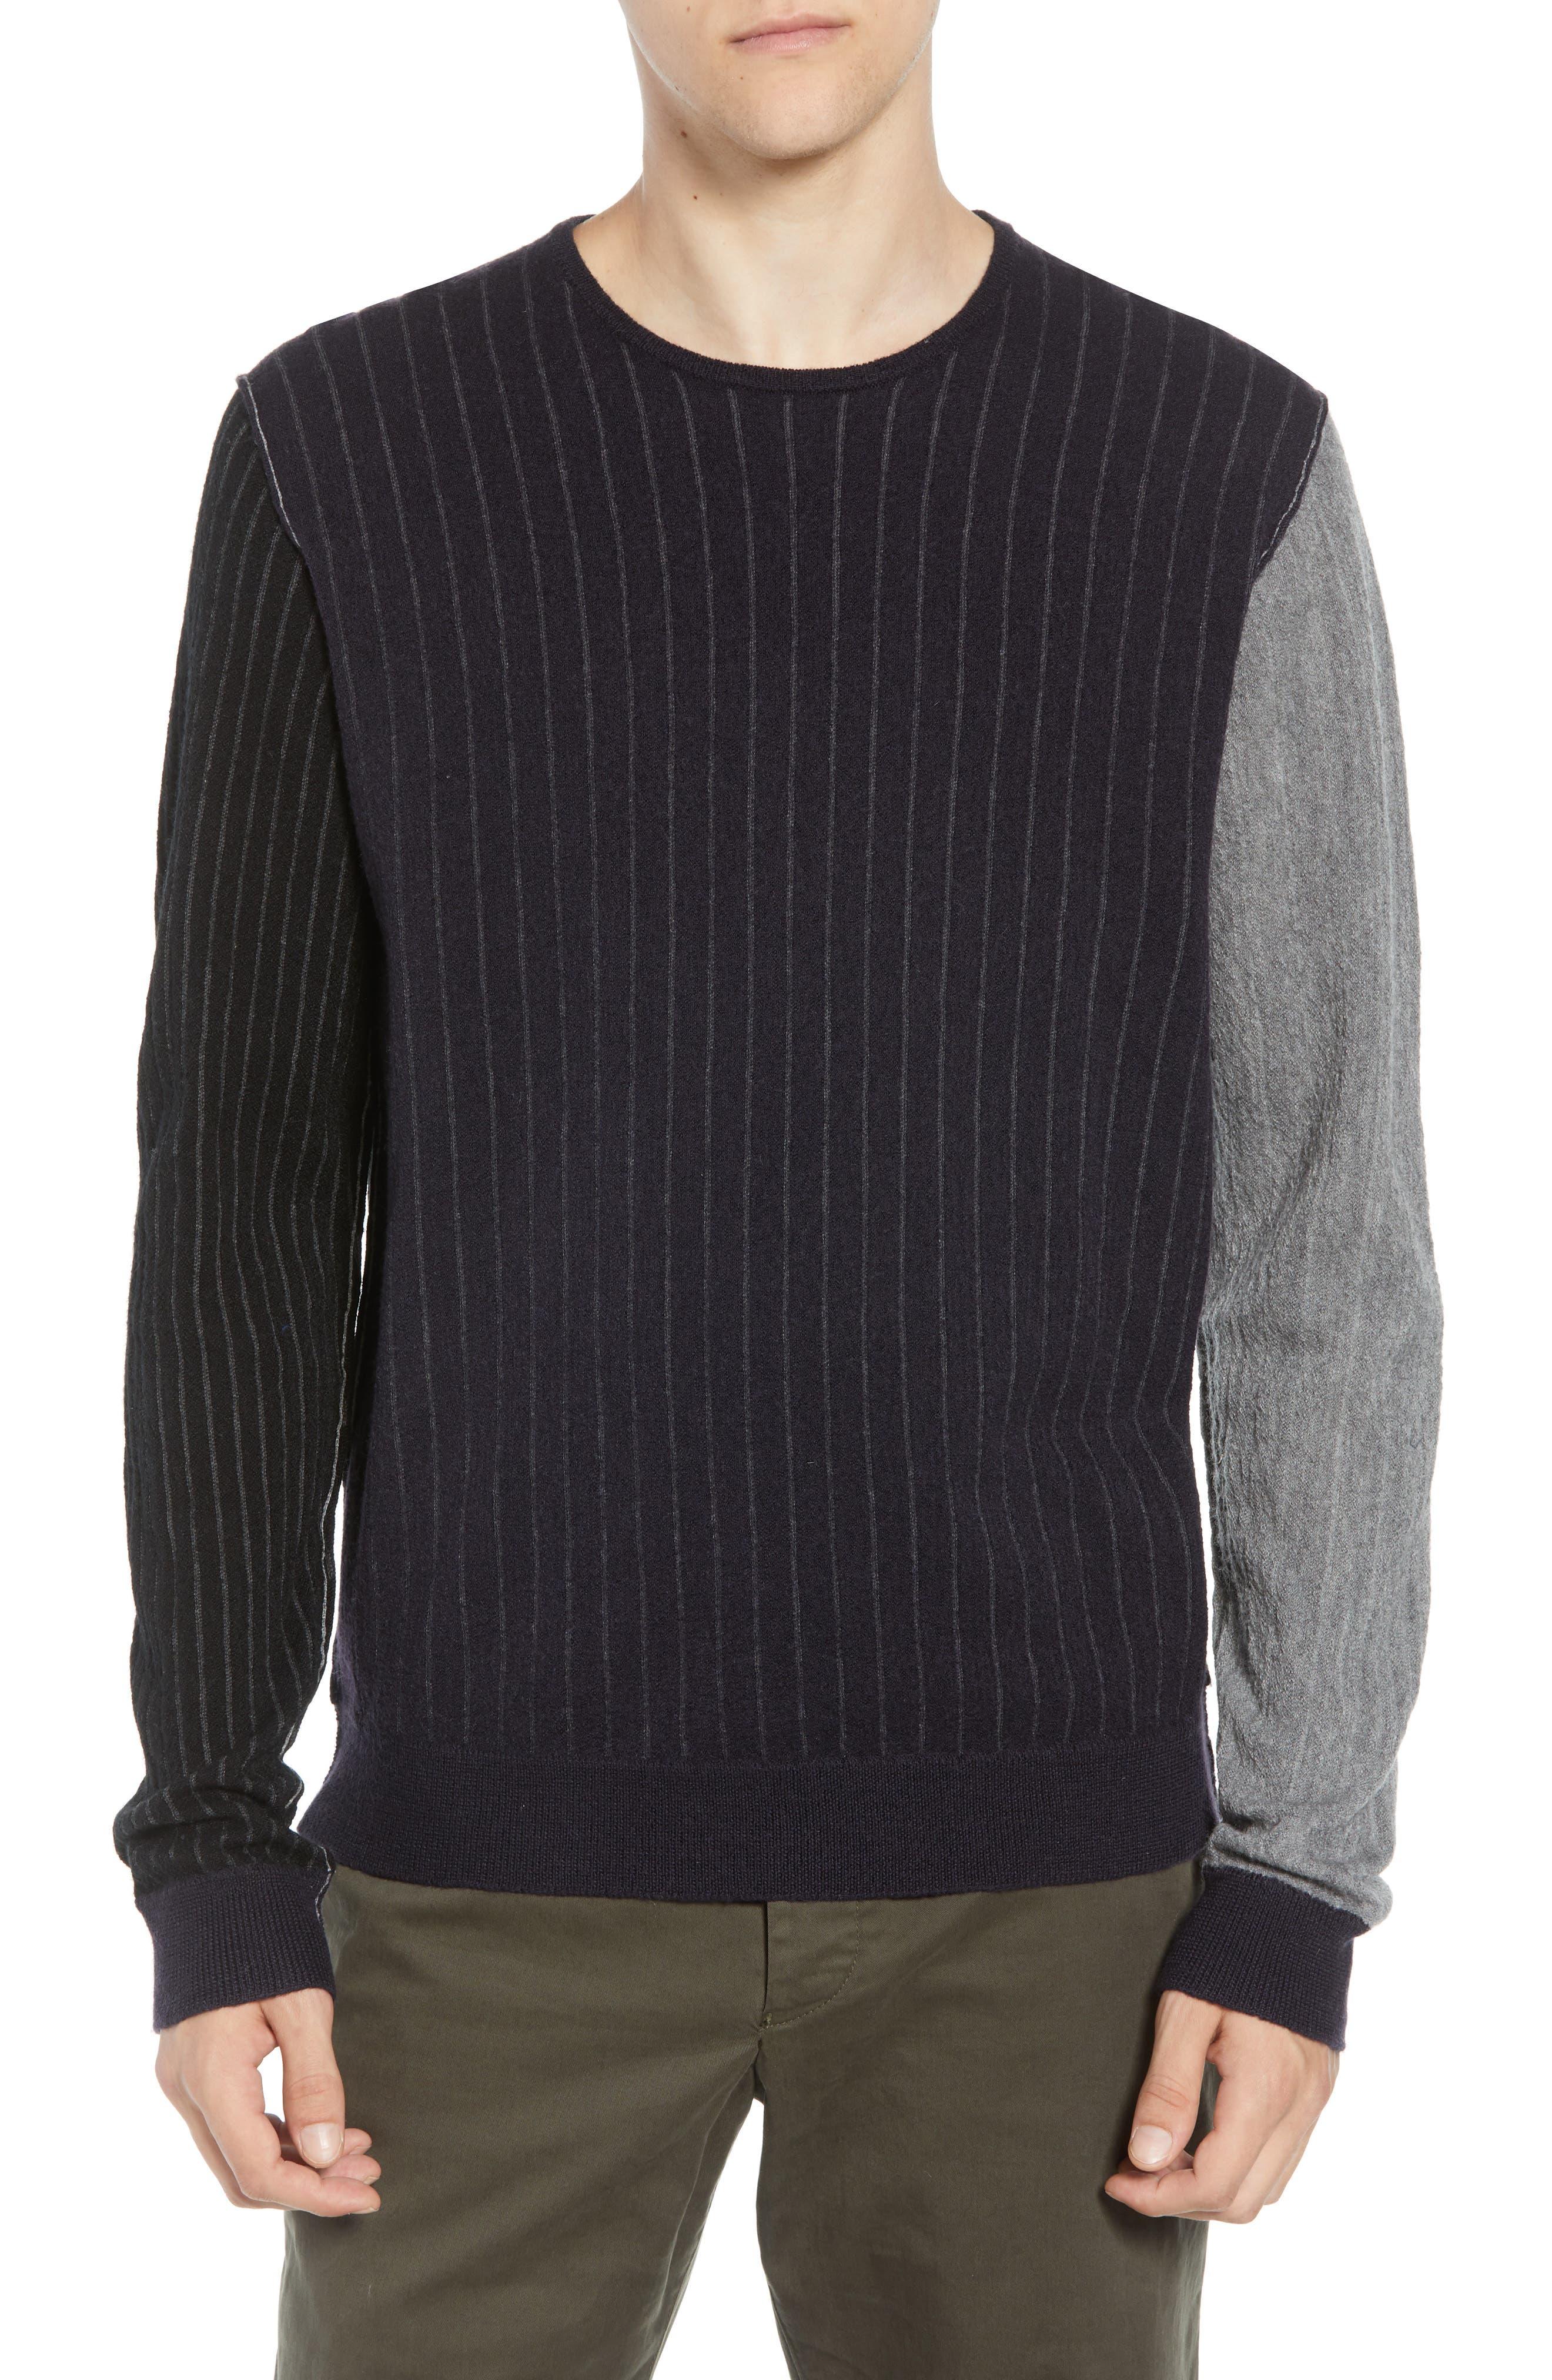 Boiled Wool Blend Crewneck Sweater,                             Main thumbnail 1, color,                             MULTI STRIPE